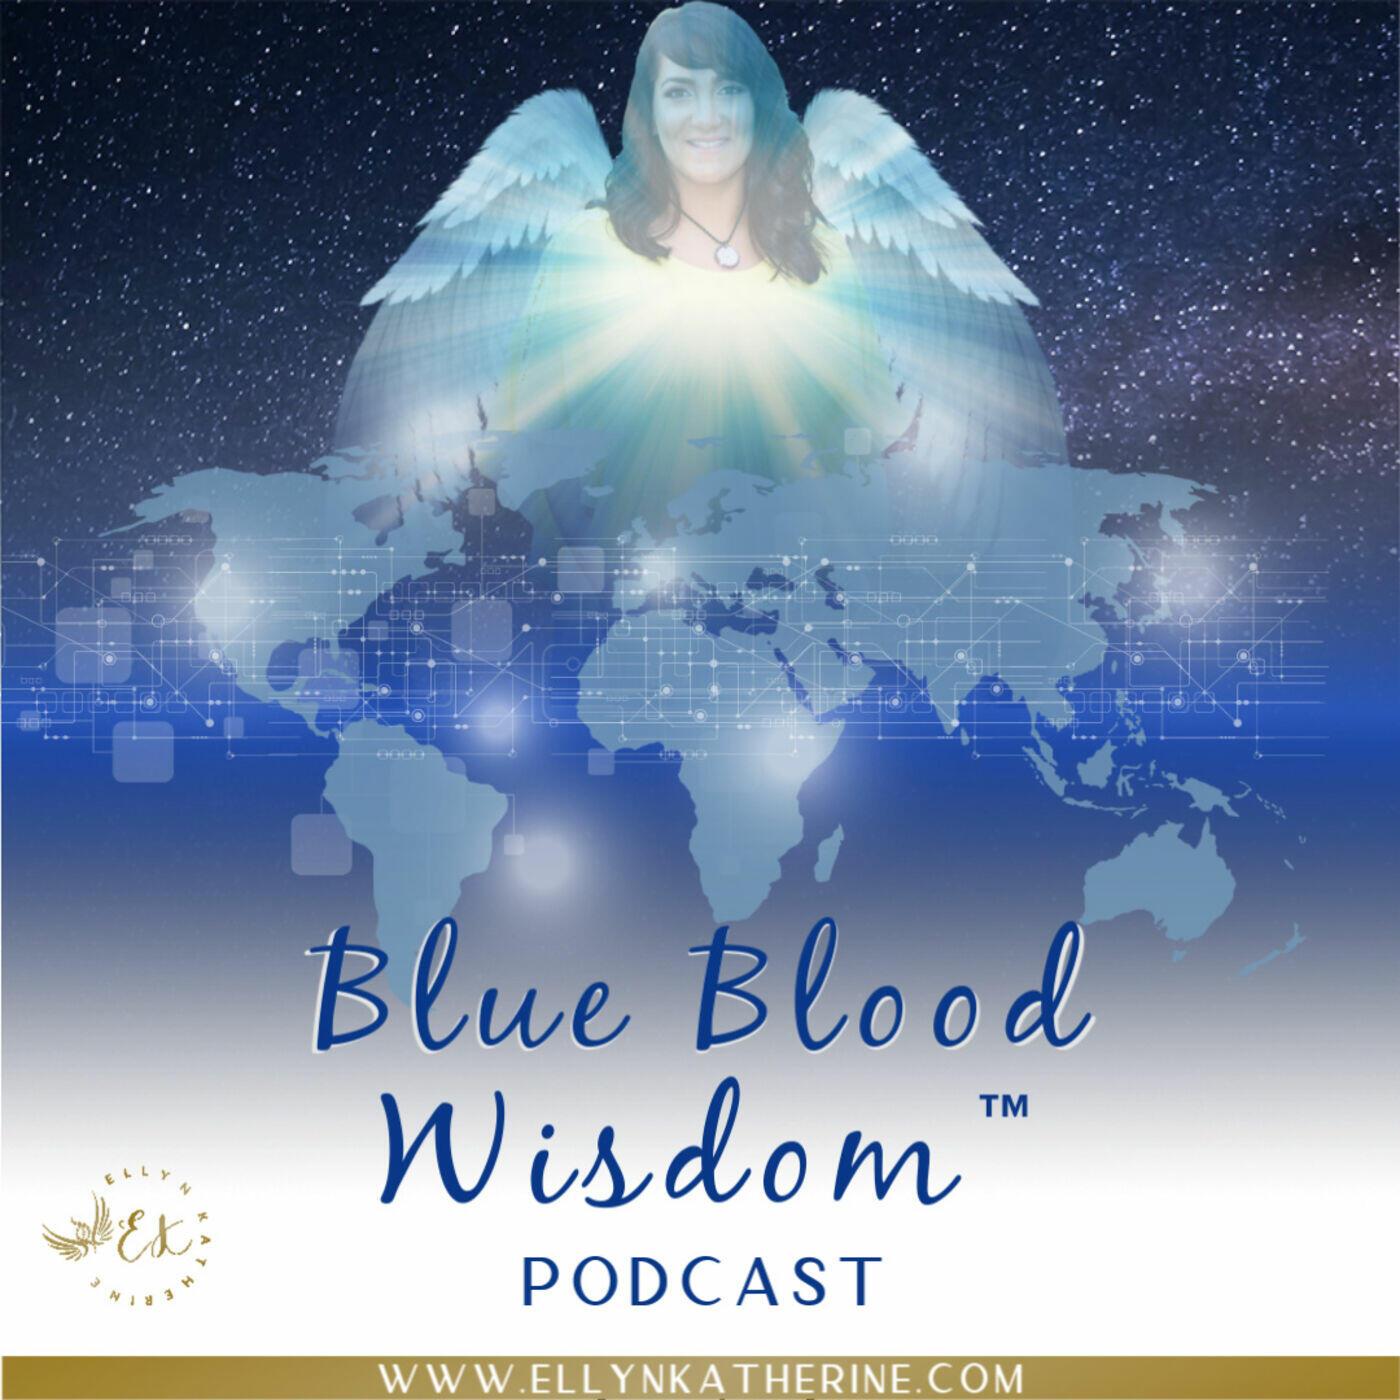 Blue Blood Wisdom with Ellyn Katherine